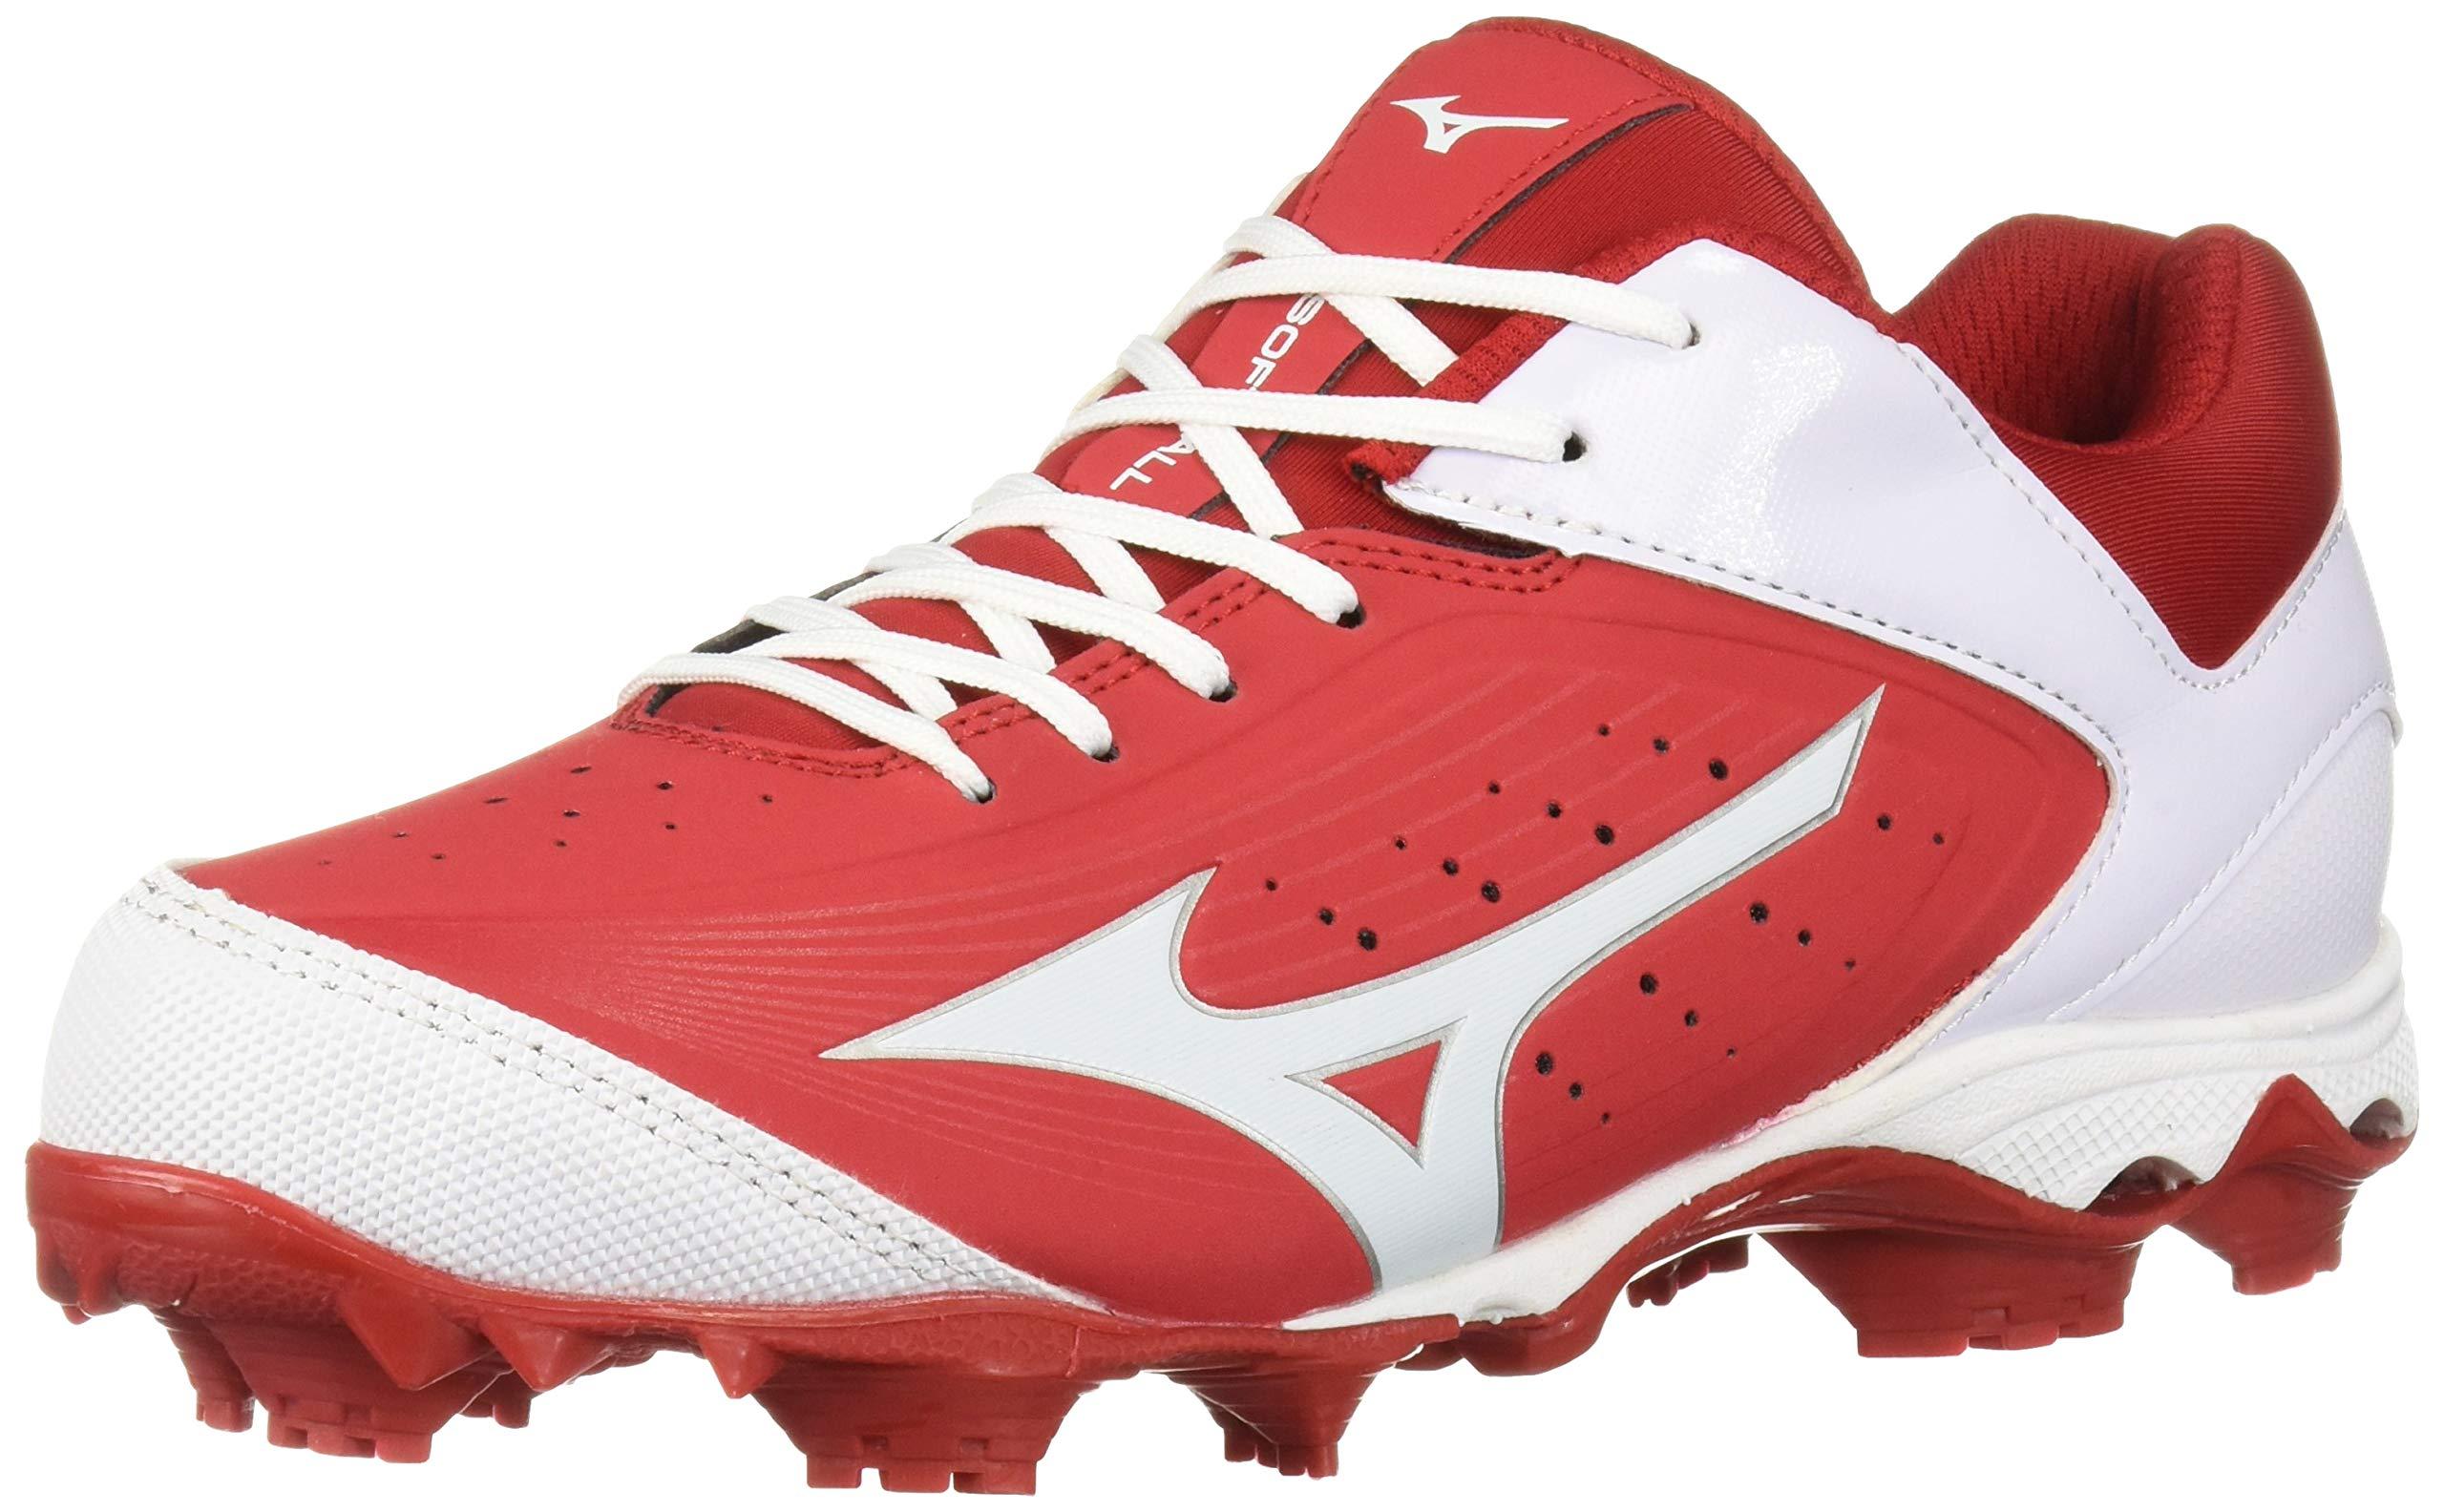 Mizuno Women's 9-Spike Advanced Finch Elite 3 Fastpitch Cleat Softball Shoe, Red/White, 8 B US by Mizuno